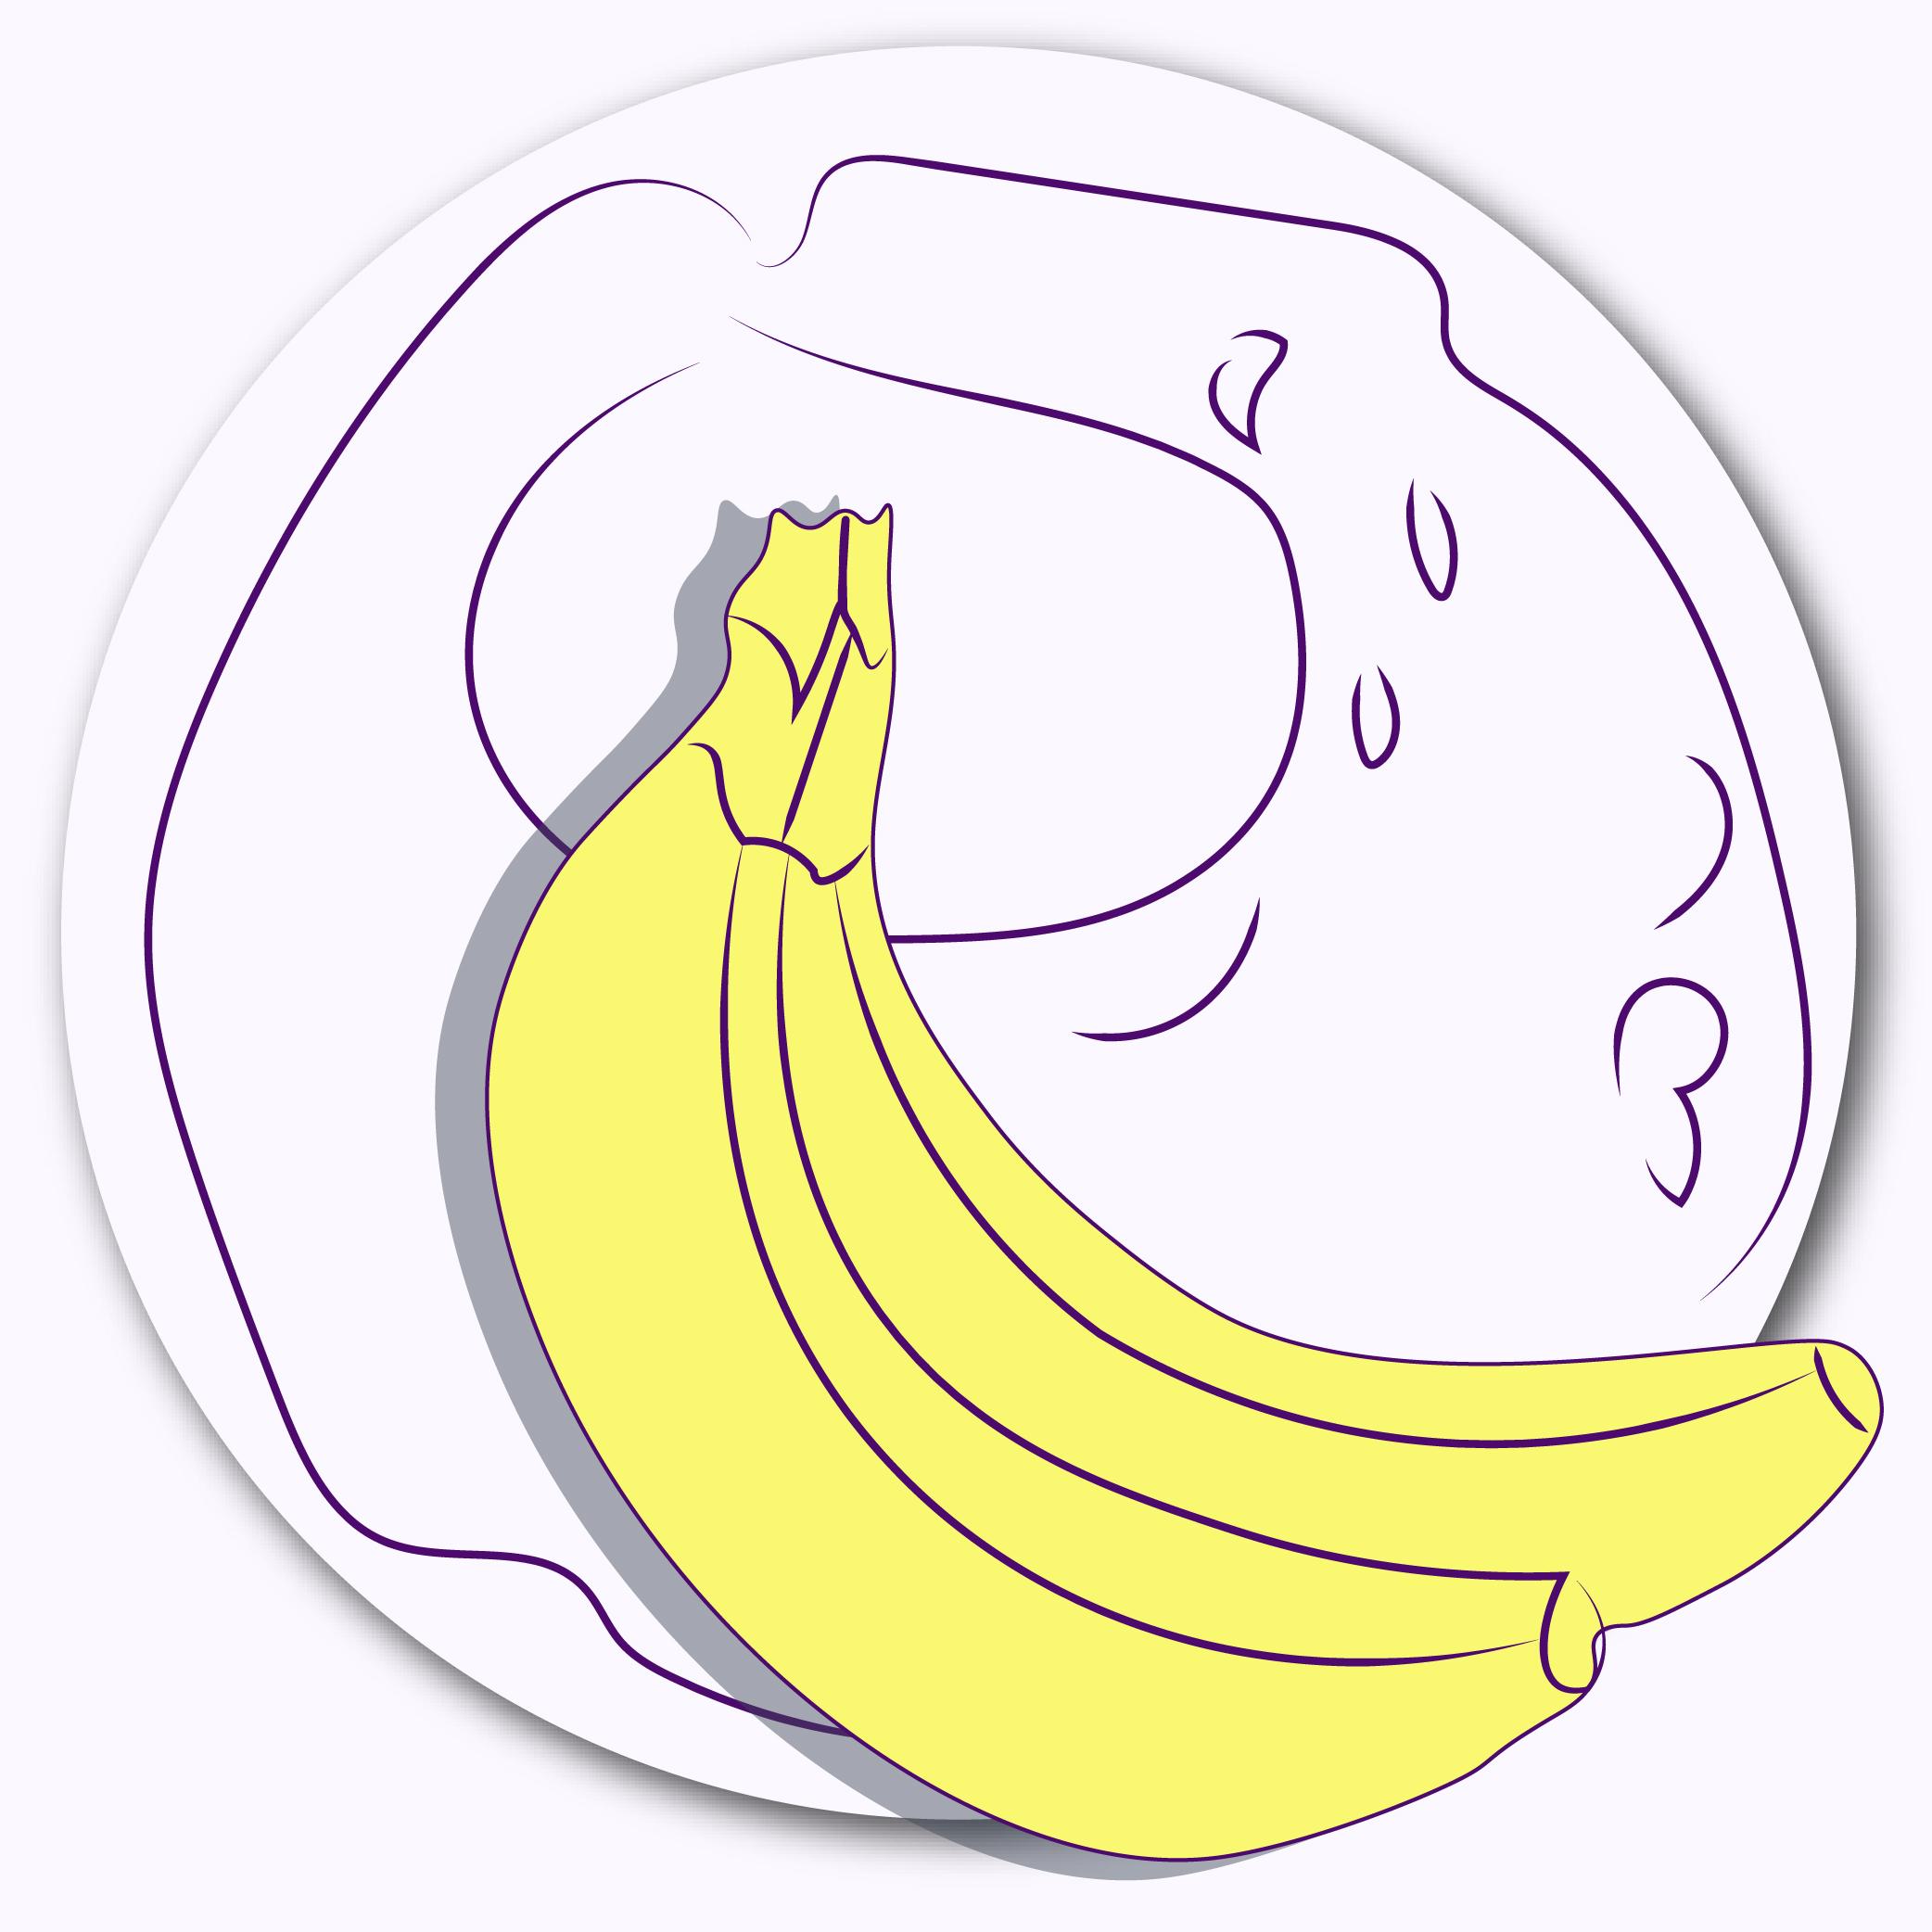 More Banana